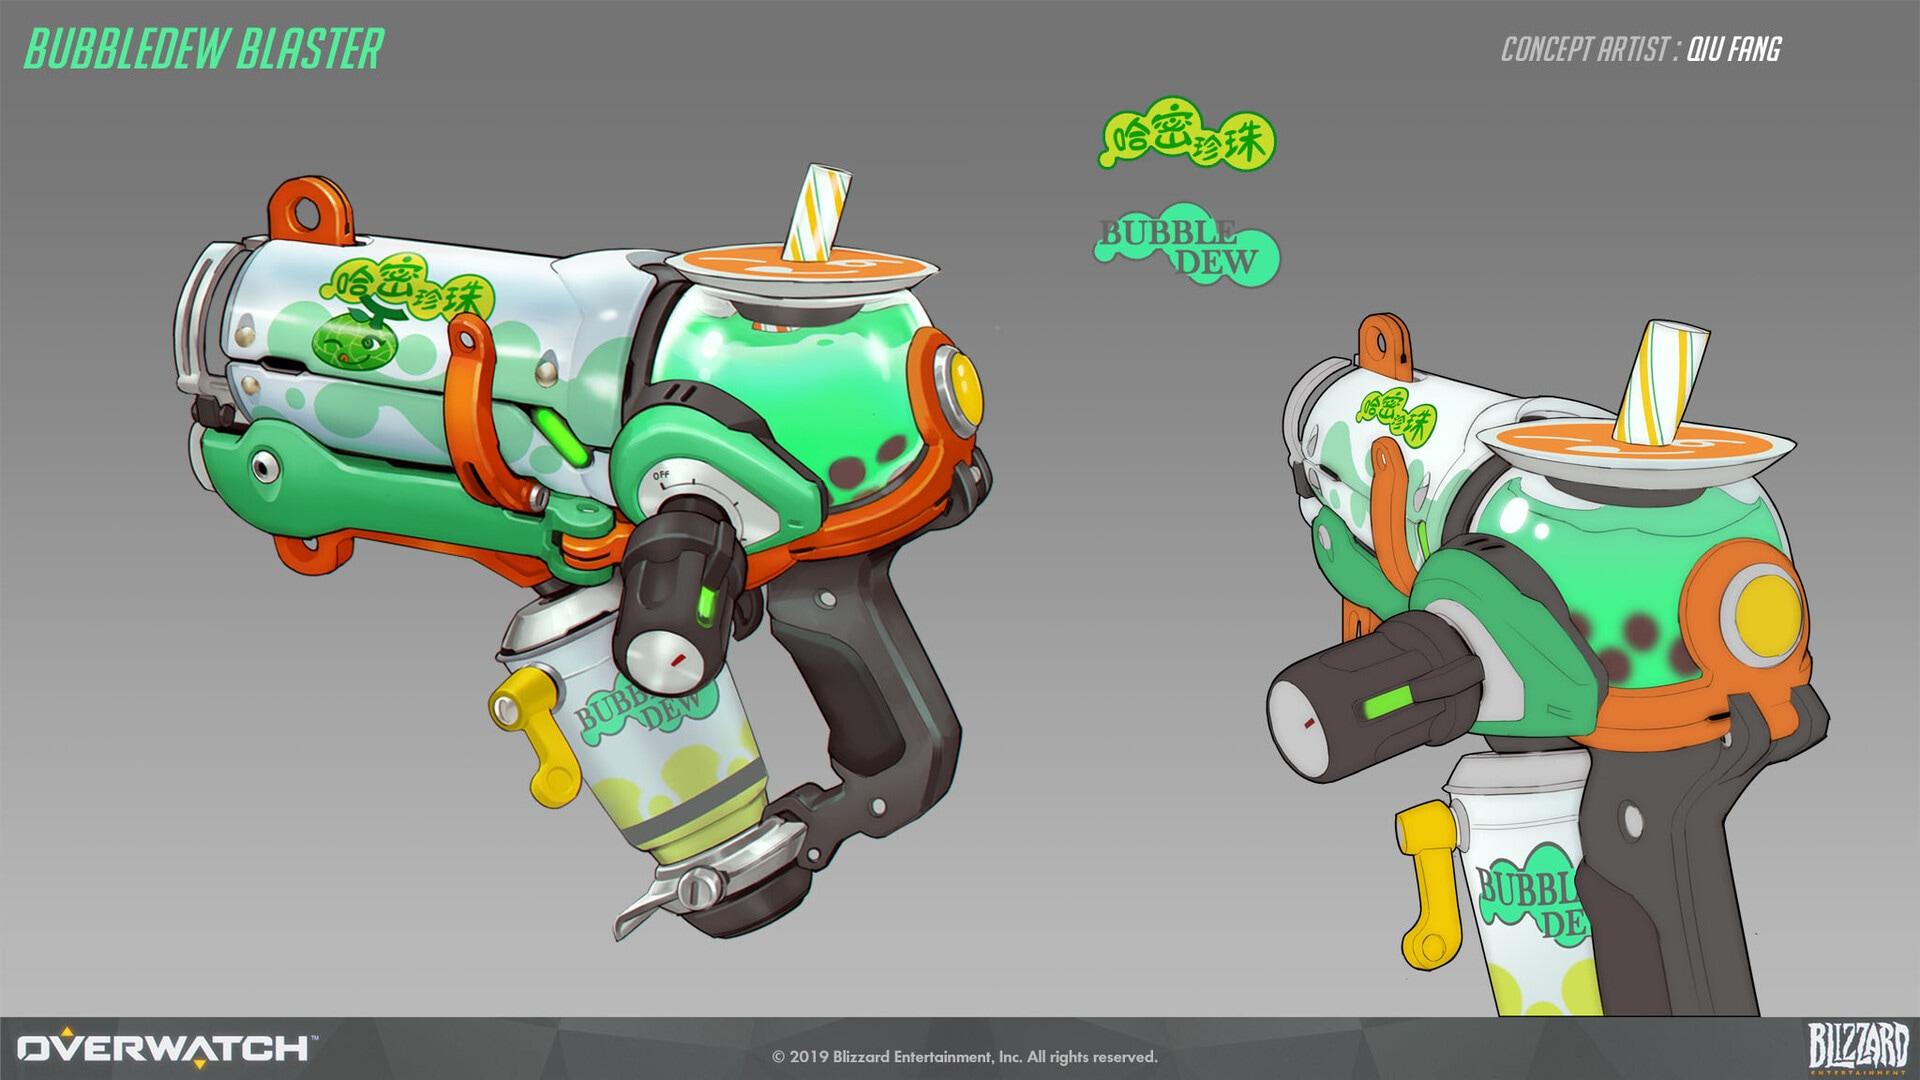 Bubbledew Blaster Concept Art